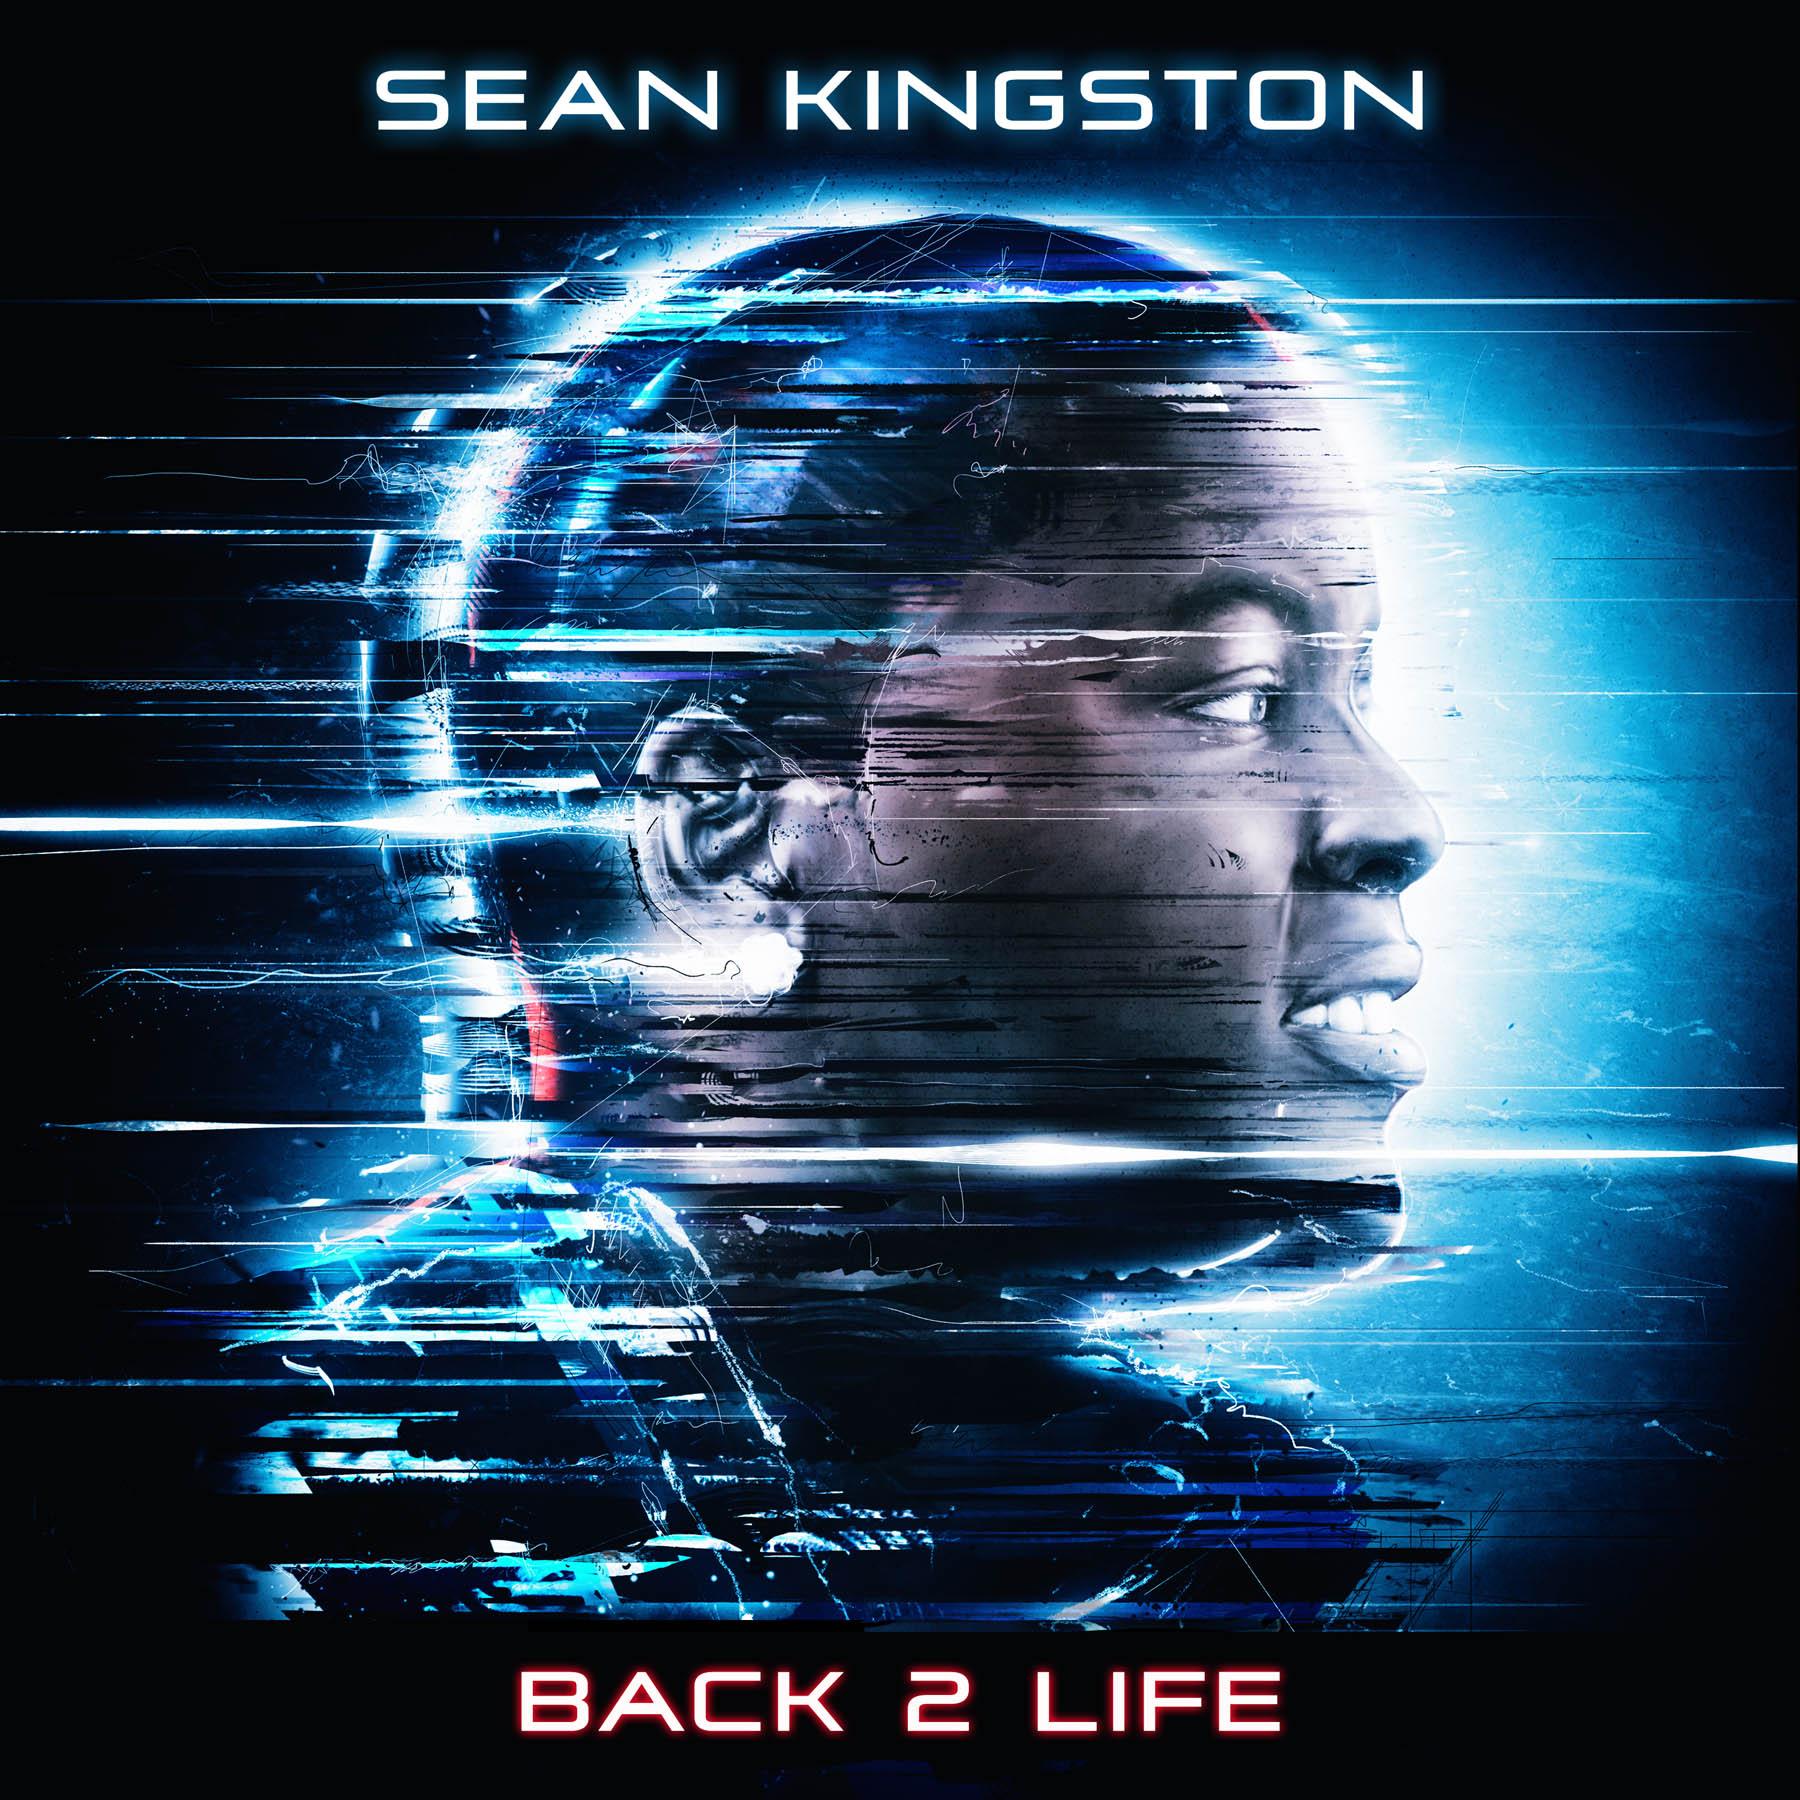 Sean Kingston — Back 2 Life